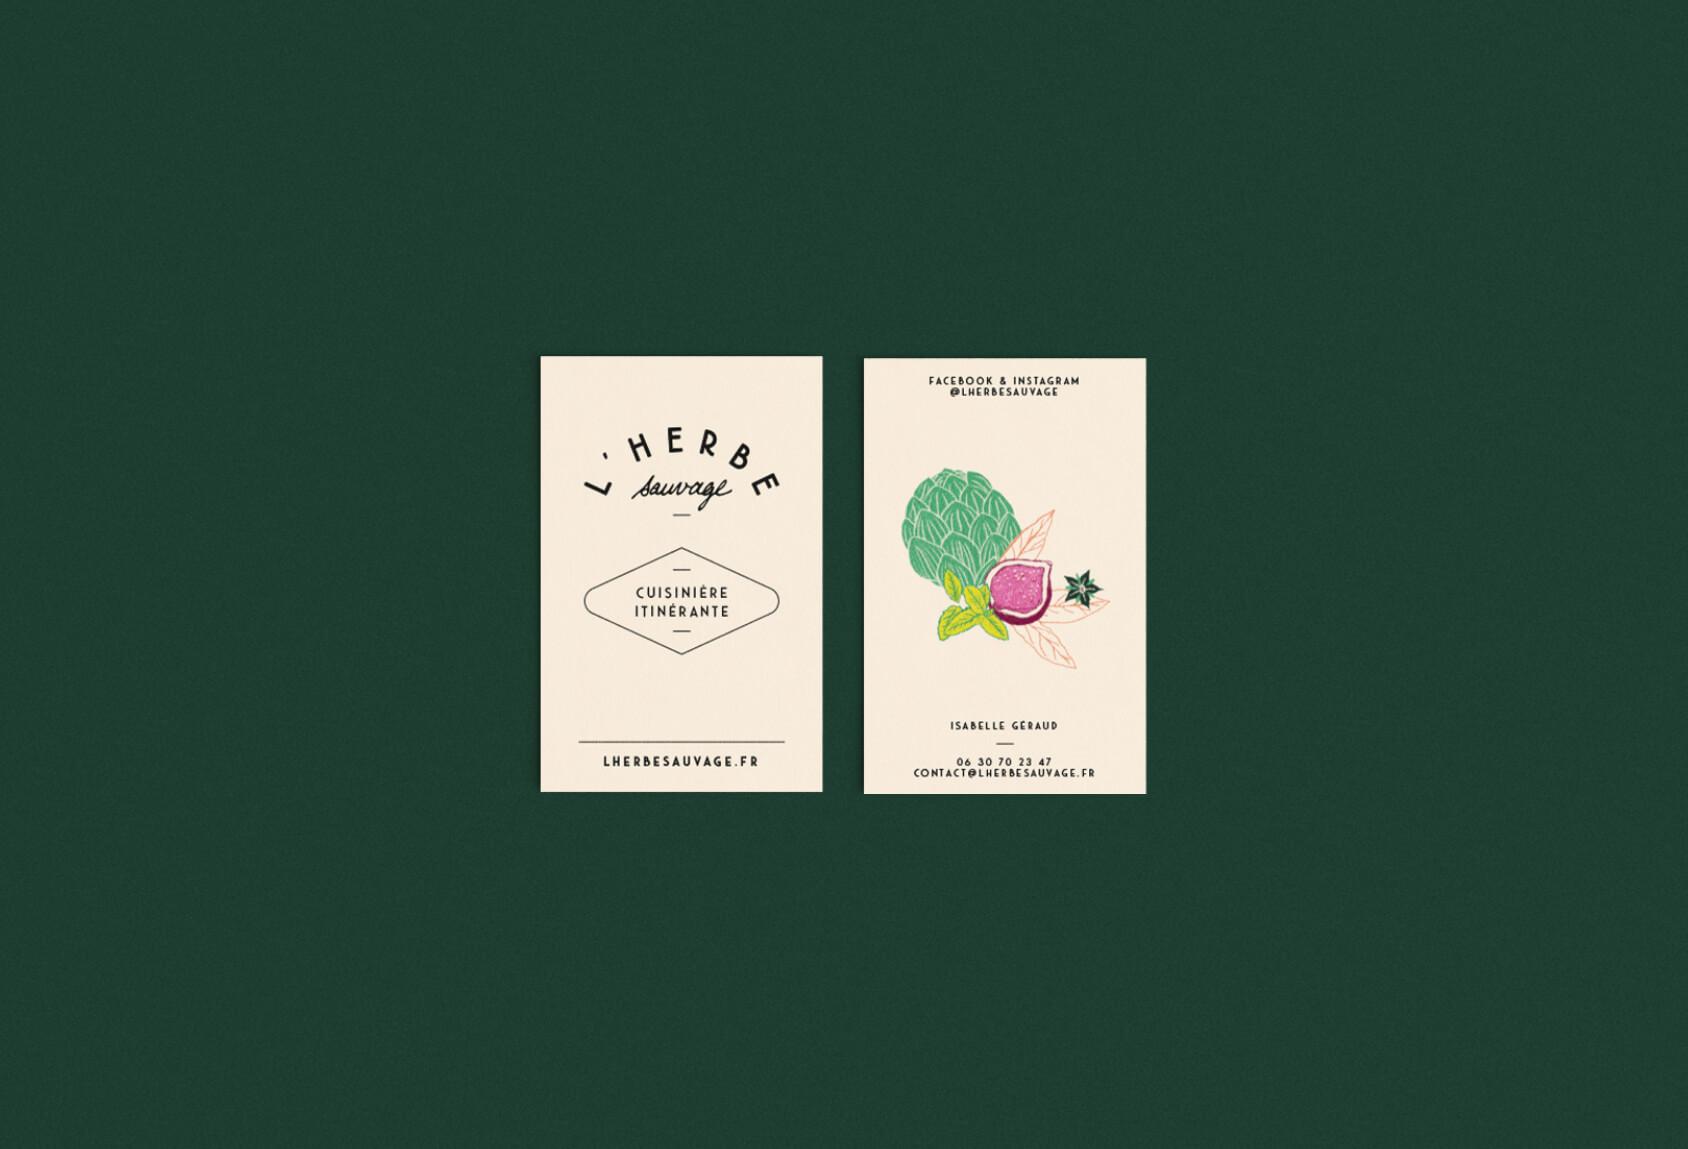 carte de visite de l'herbe sauvage, cuisinière itinérante